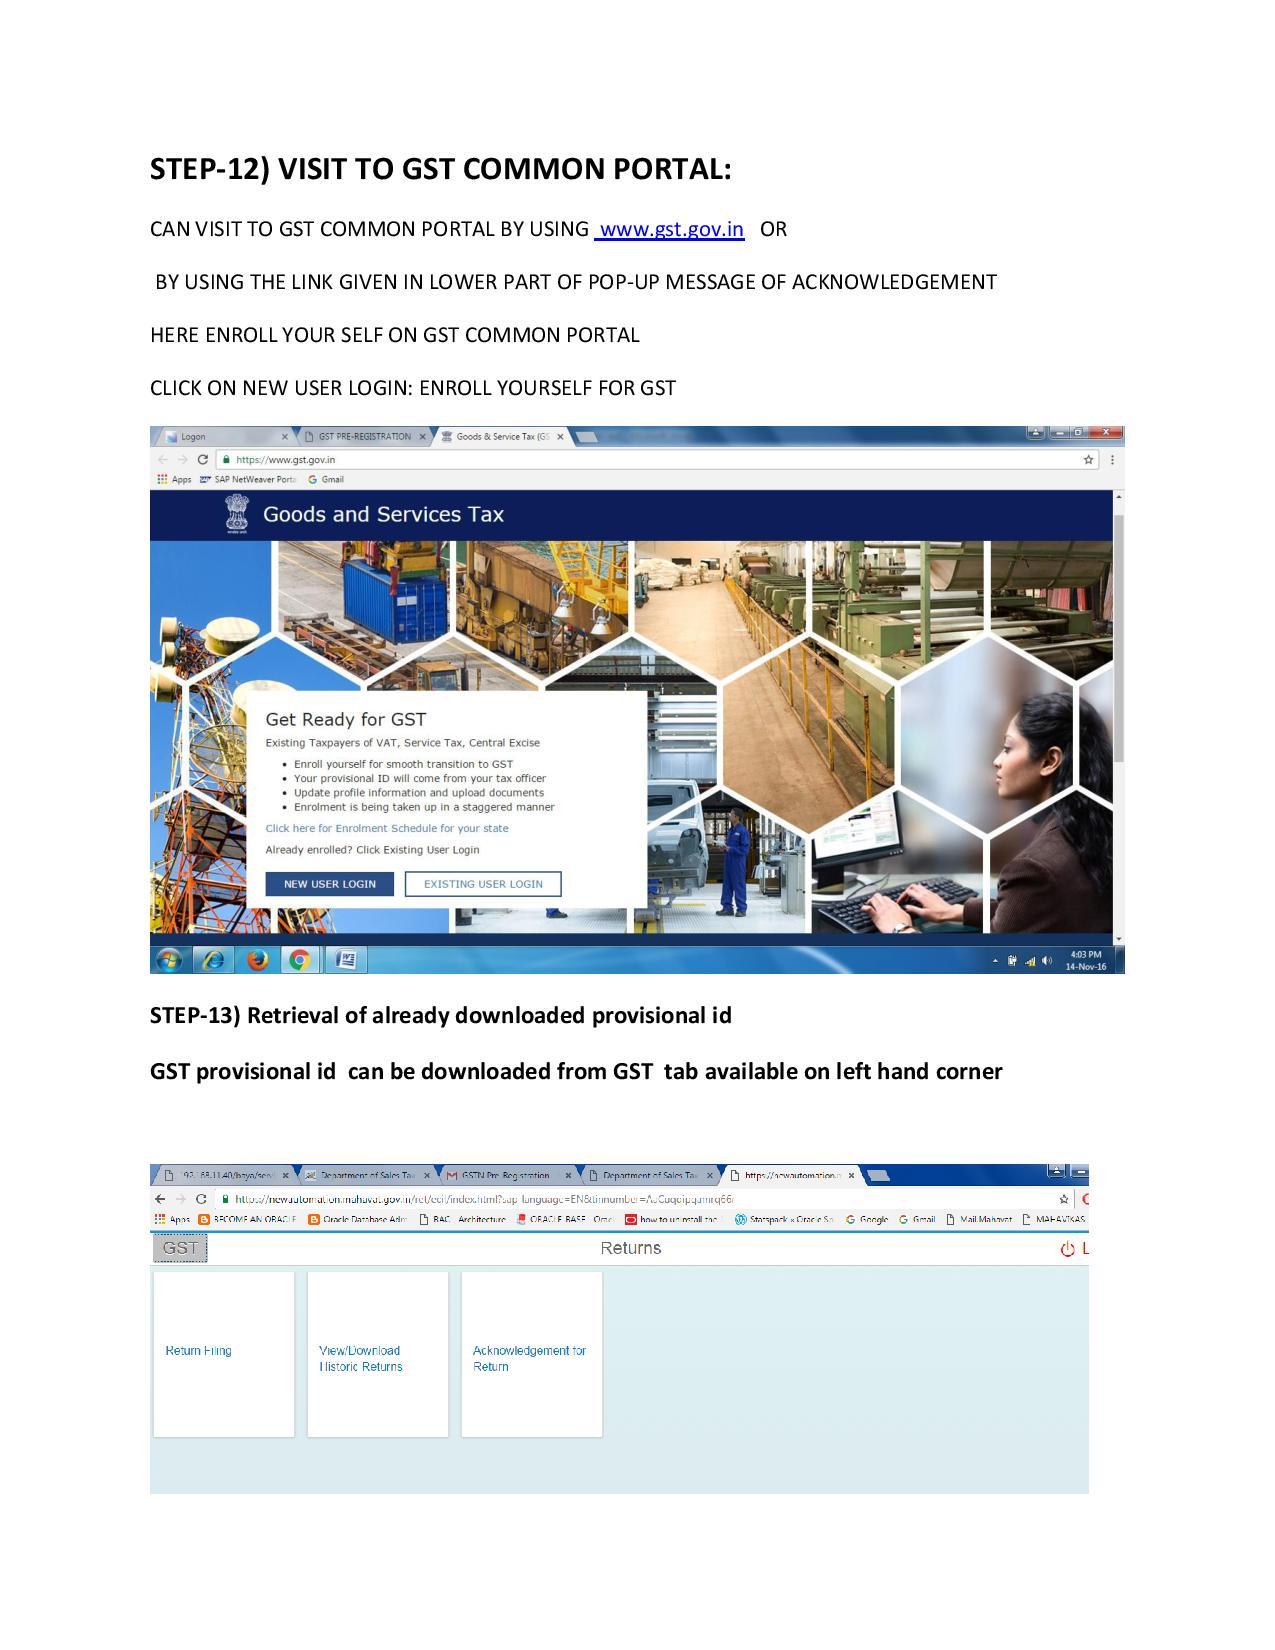 User Manual: GST Enrollment